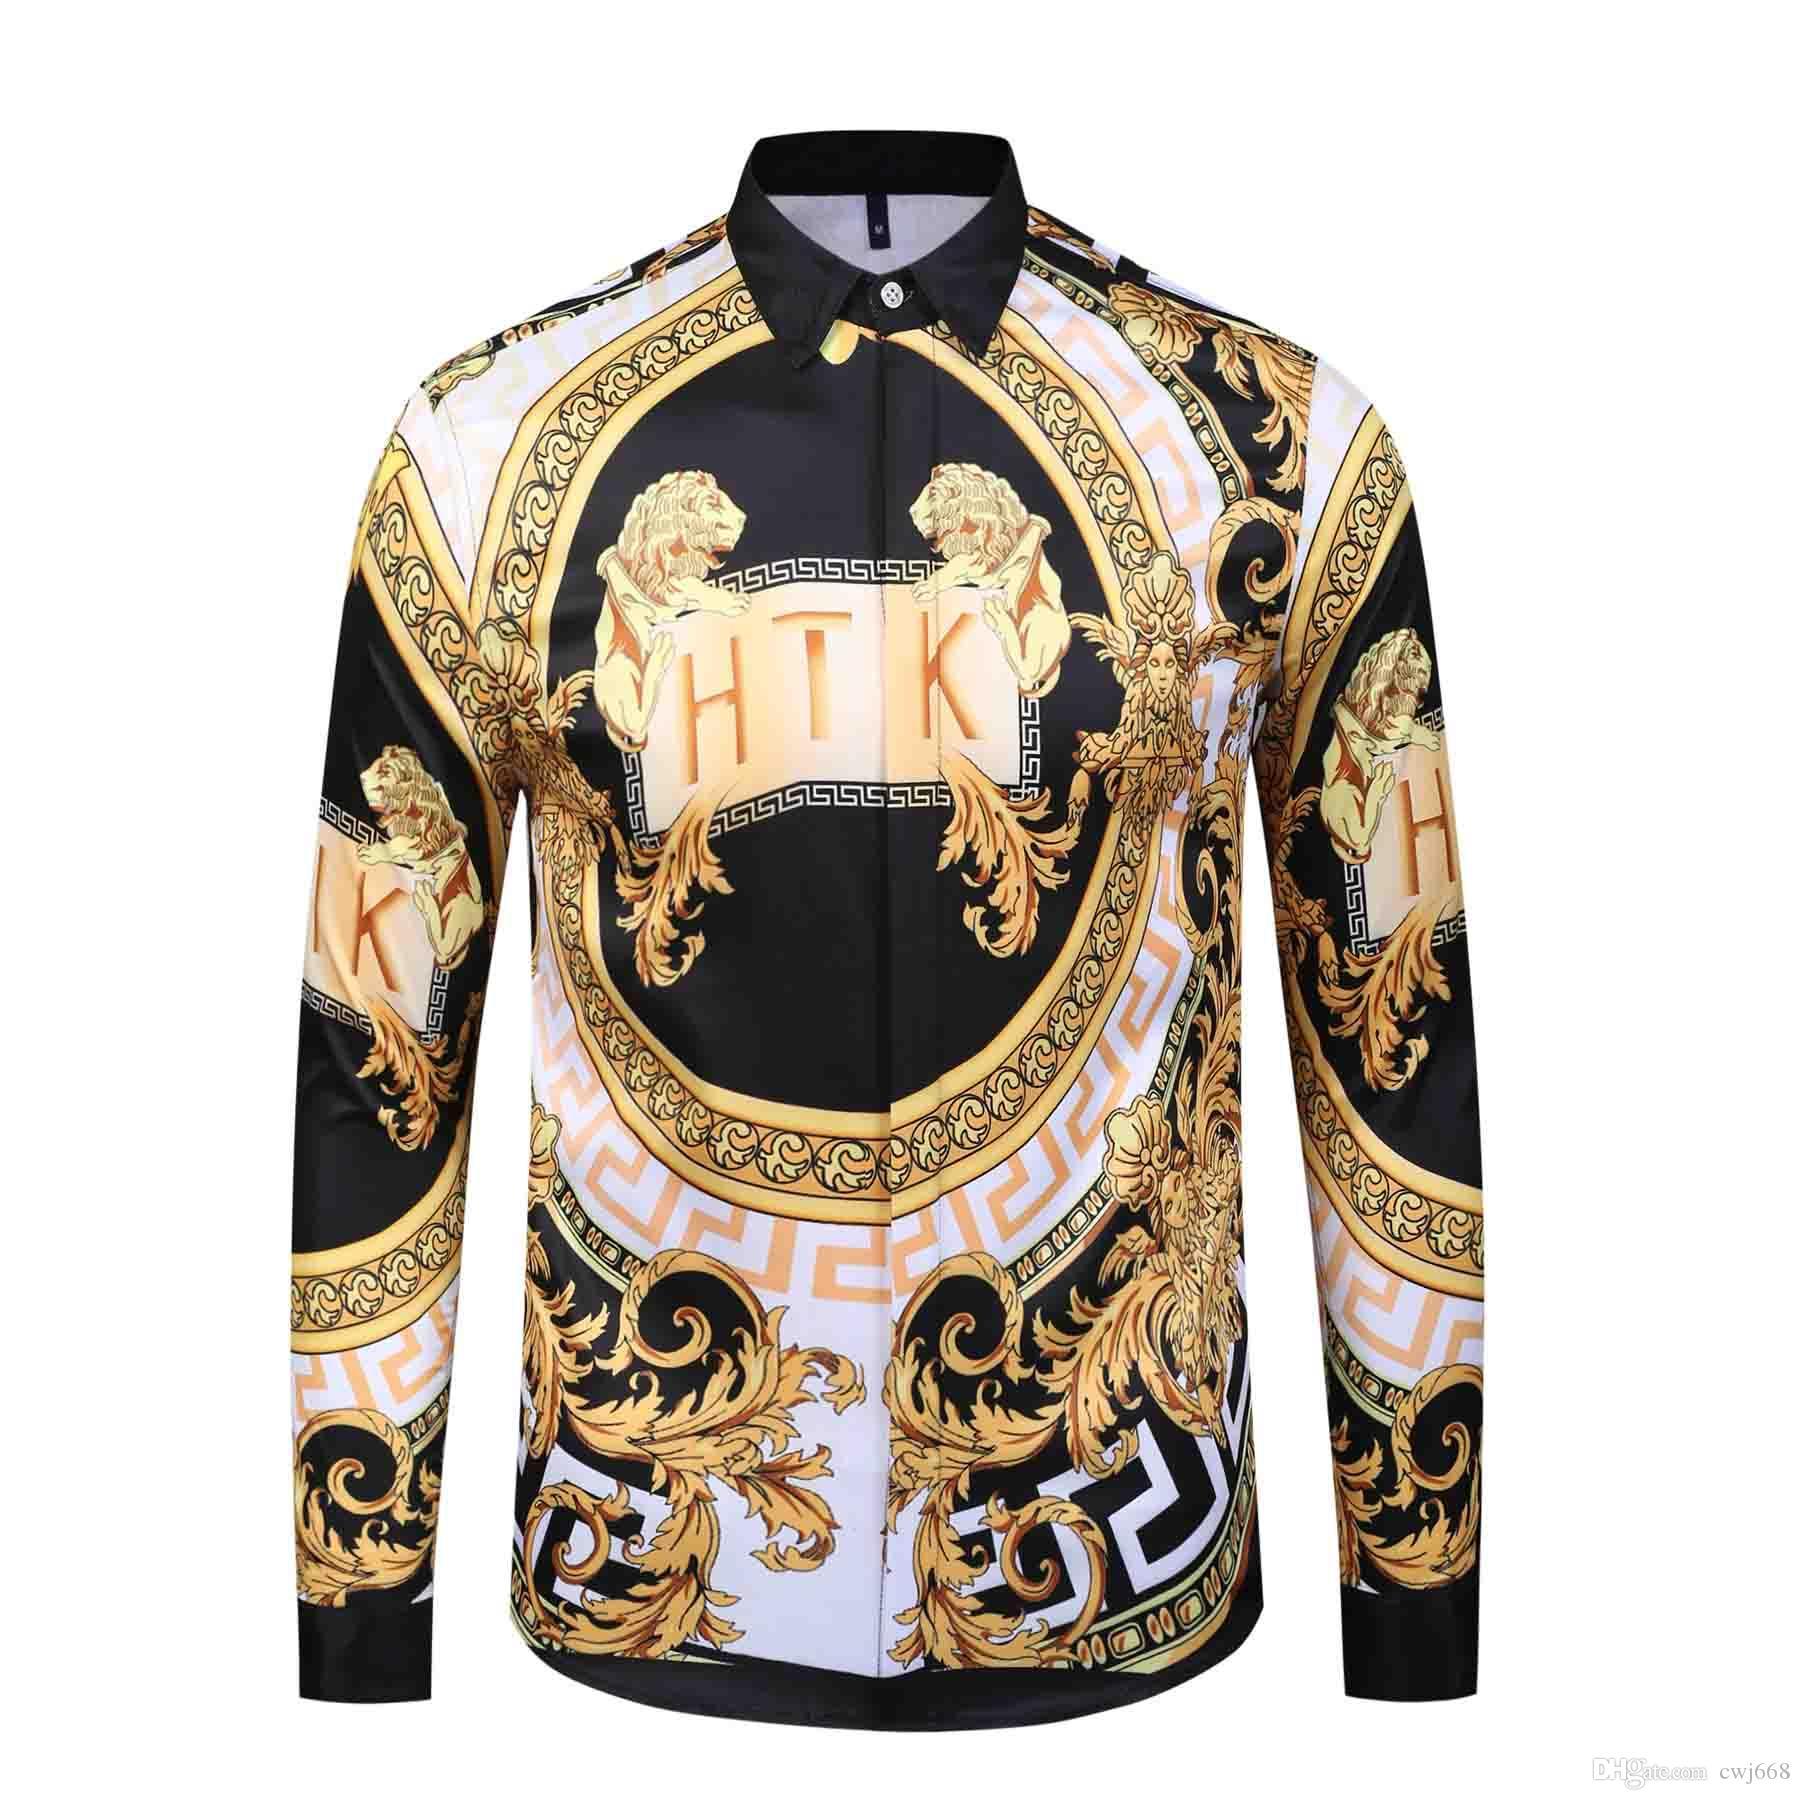 # 8650British Diseño real camisa clásica BBR a cuadros de los hombres de manga larga camisa de la manera ocasional medusa camisa de vestir de los hombres puros Oxford